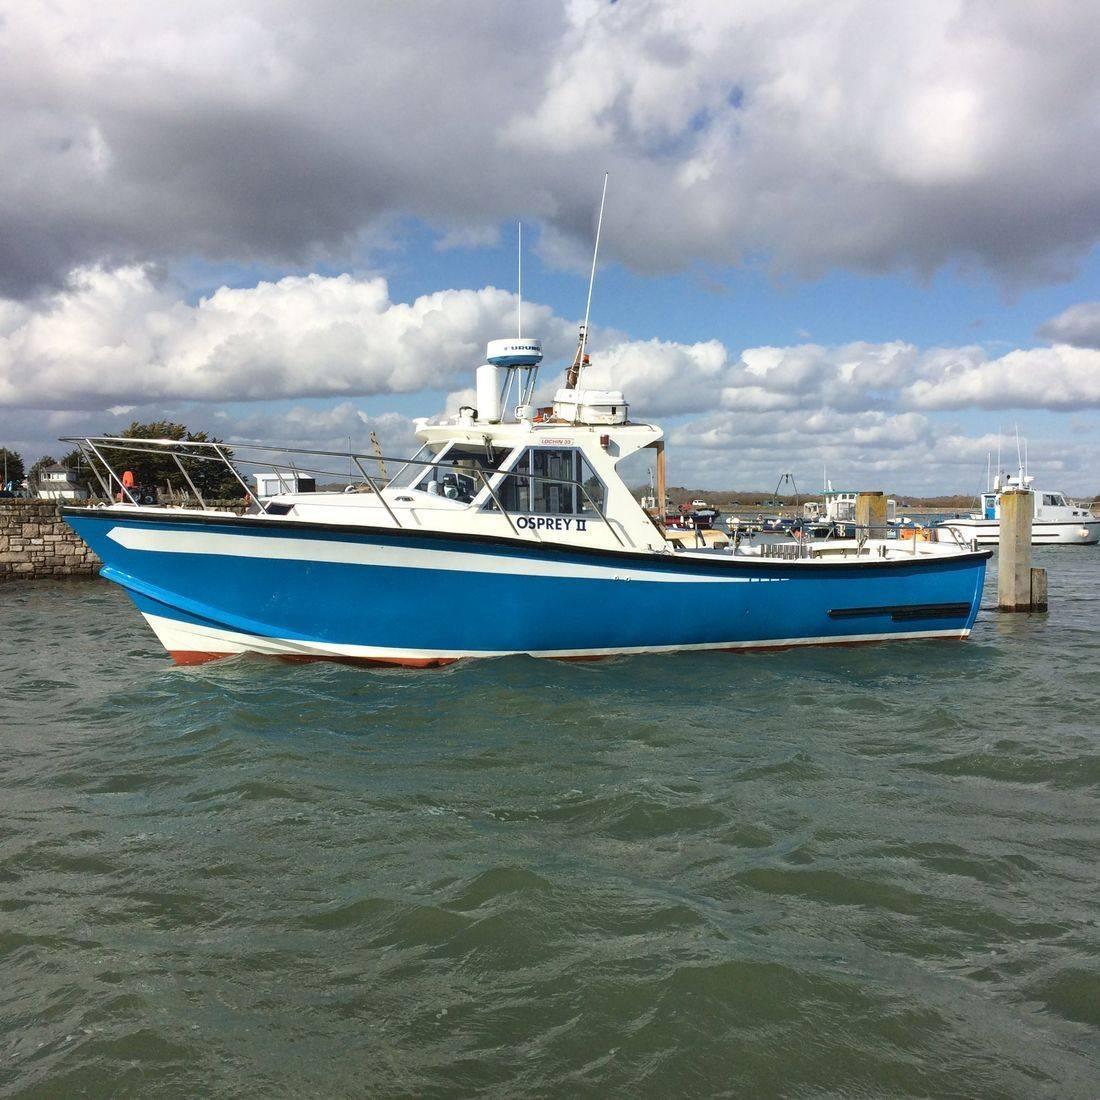 Fishing boat Osprey II at Keyhaven